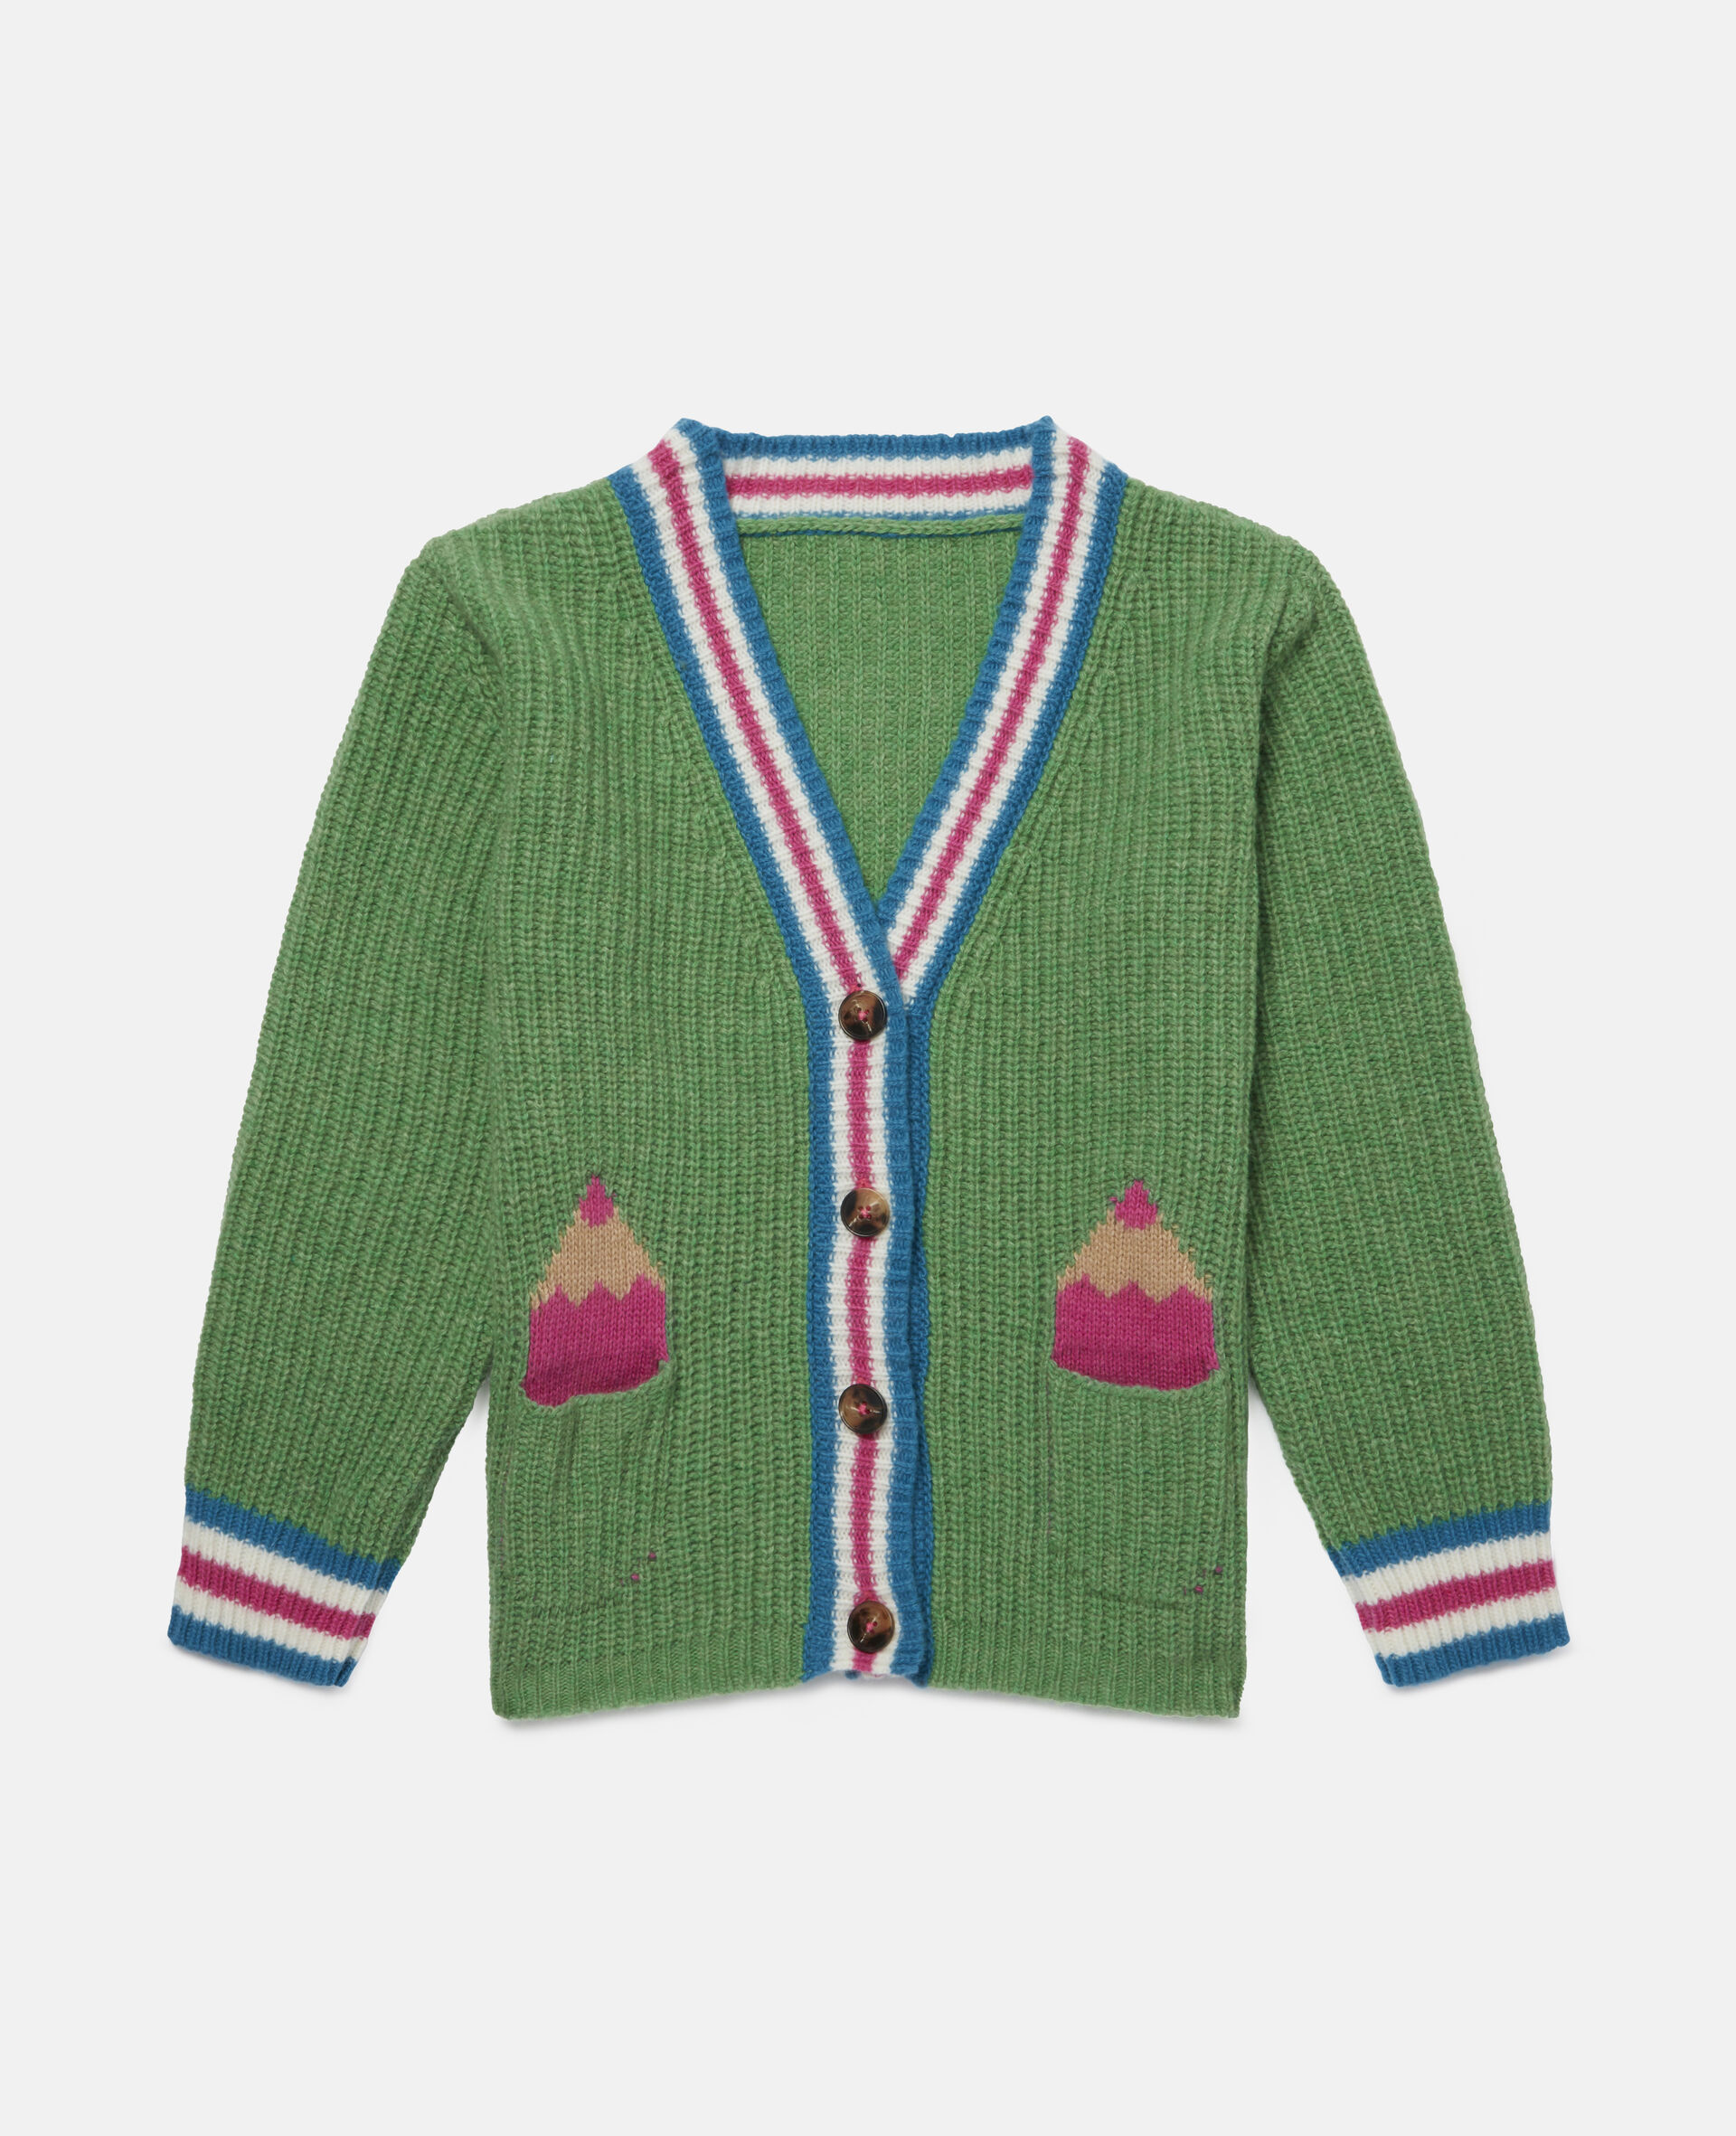 Pencils Knit Intarsia Cardigan -Green-large image number 0